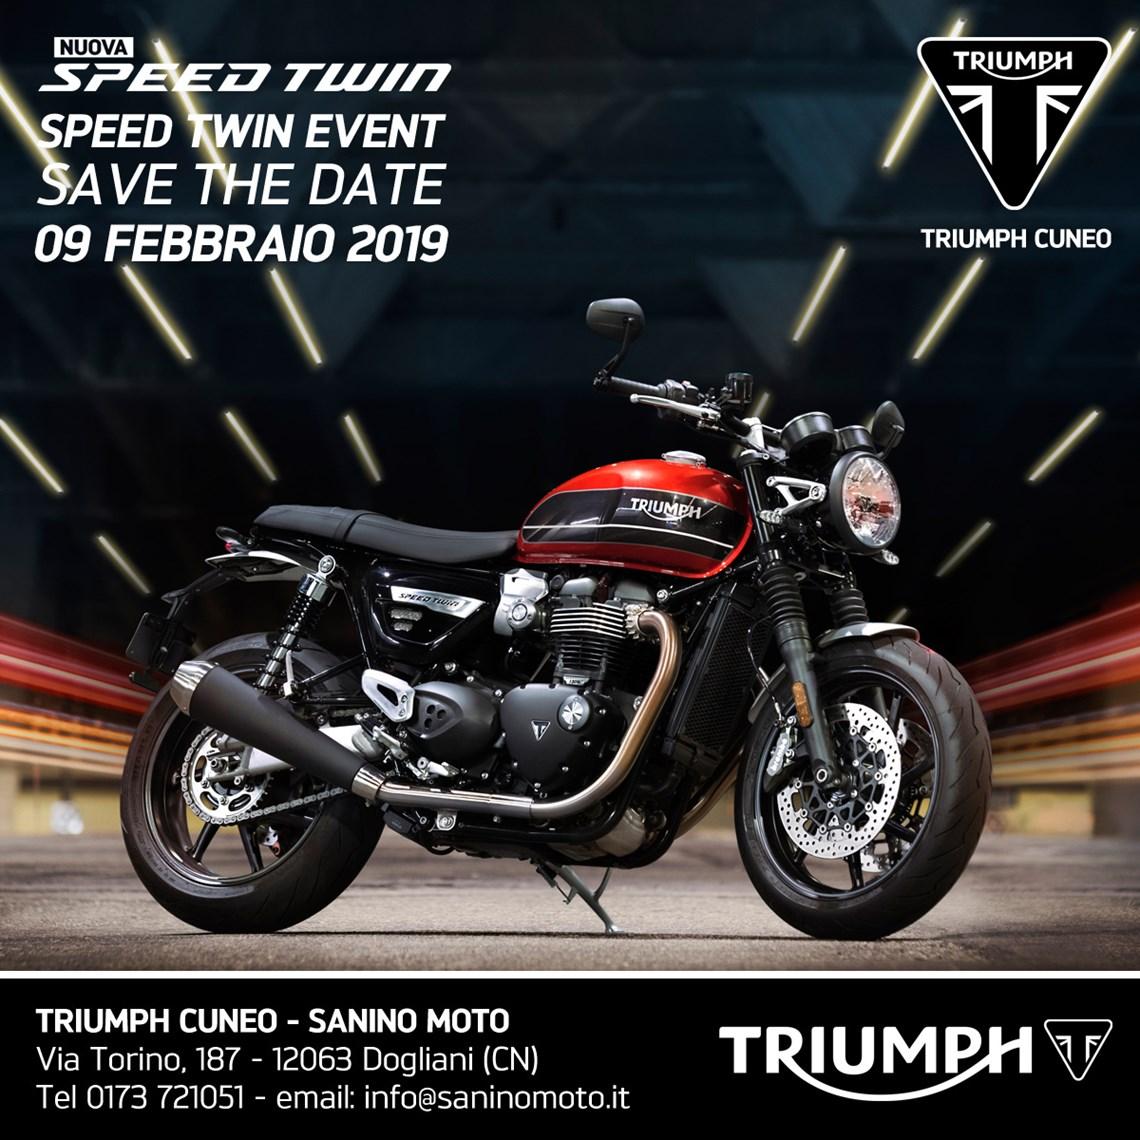 Speed Twin - Triumph Cuneo